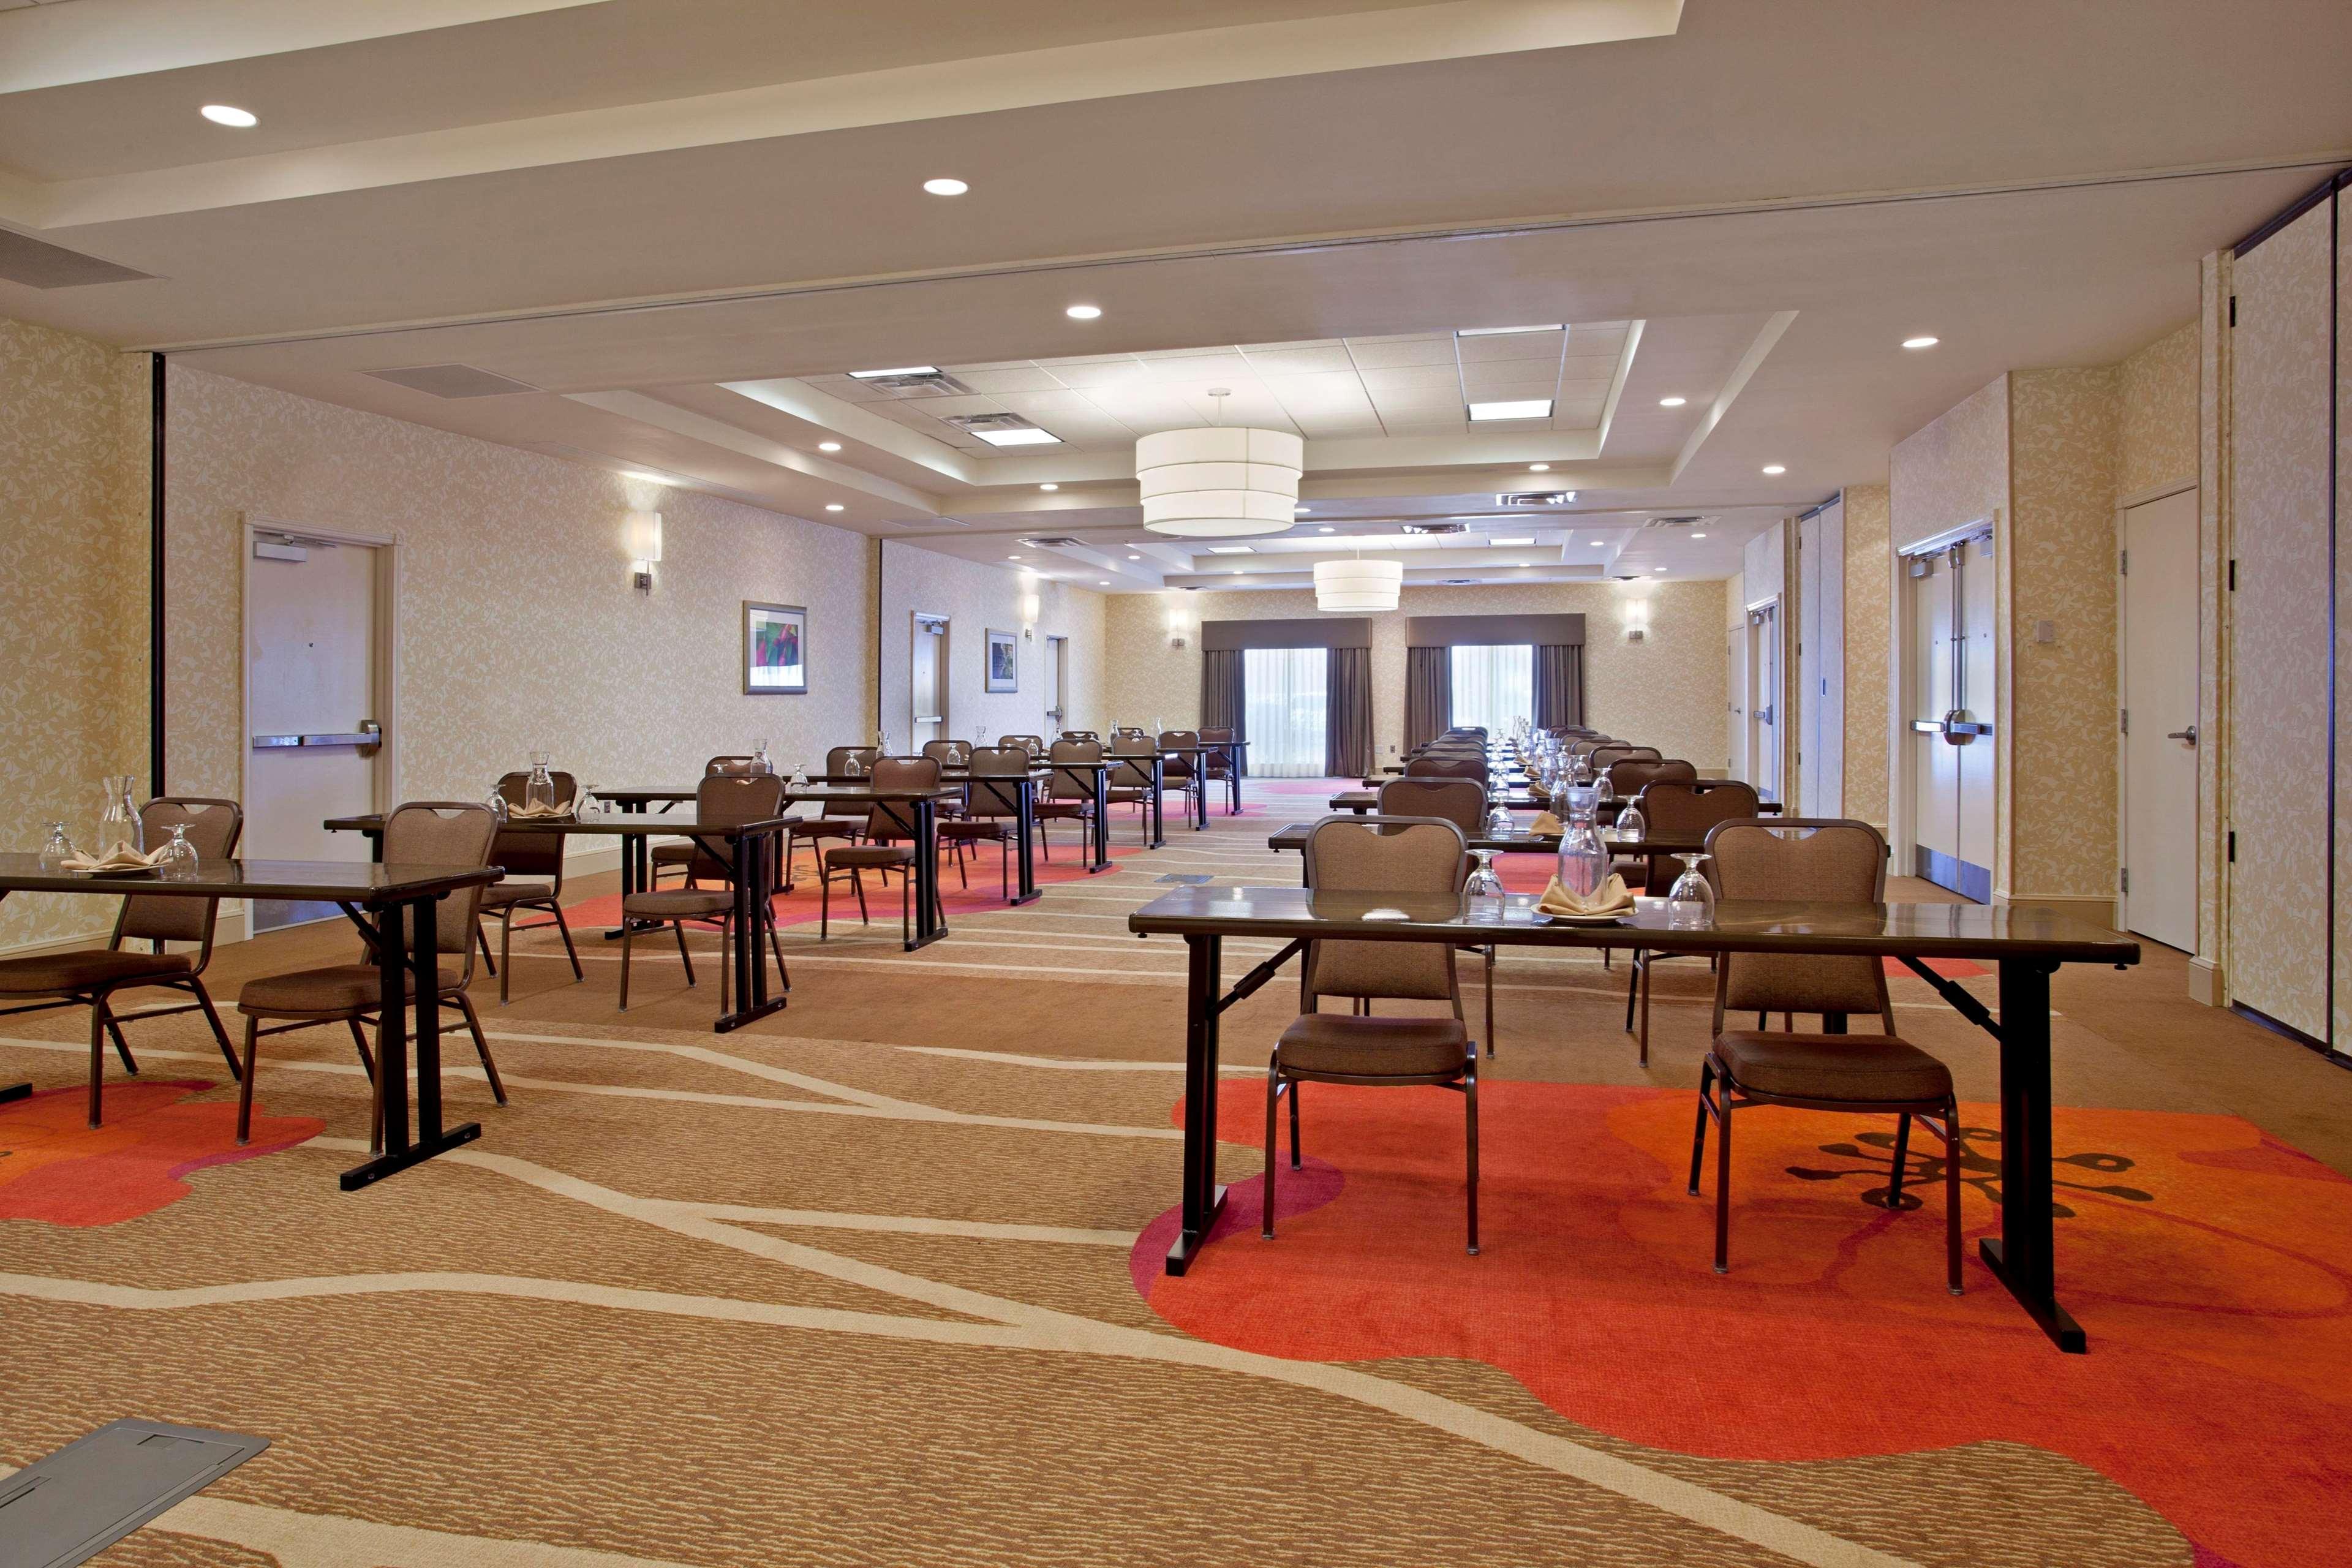 Hilton Garden Inn Fort Collins In Fort Collins Co 80528